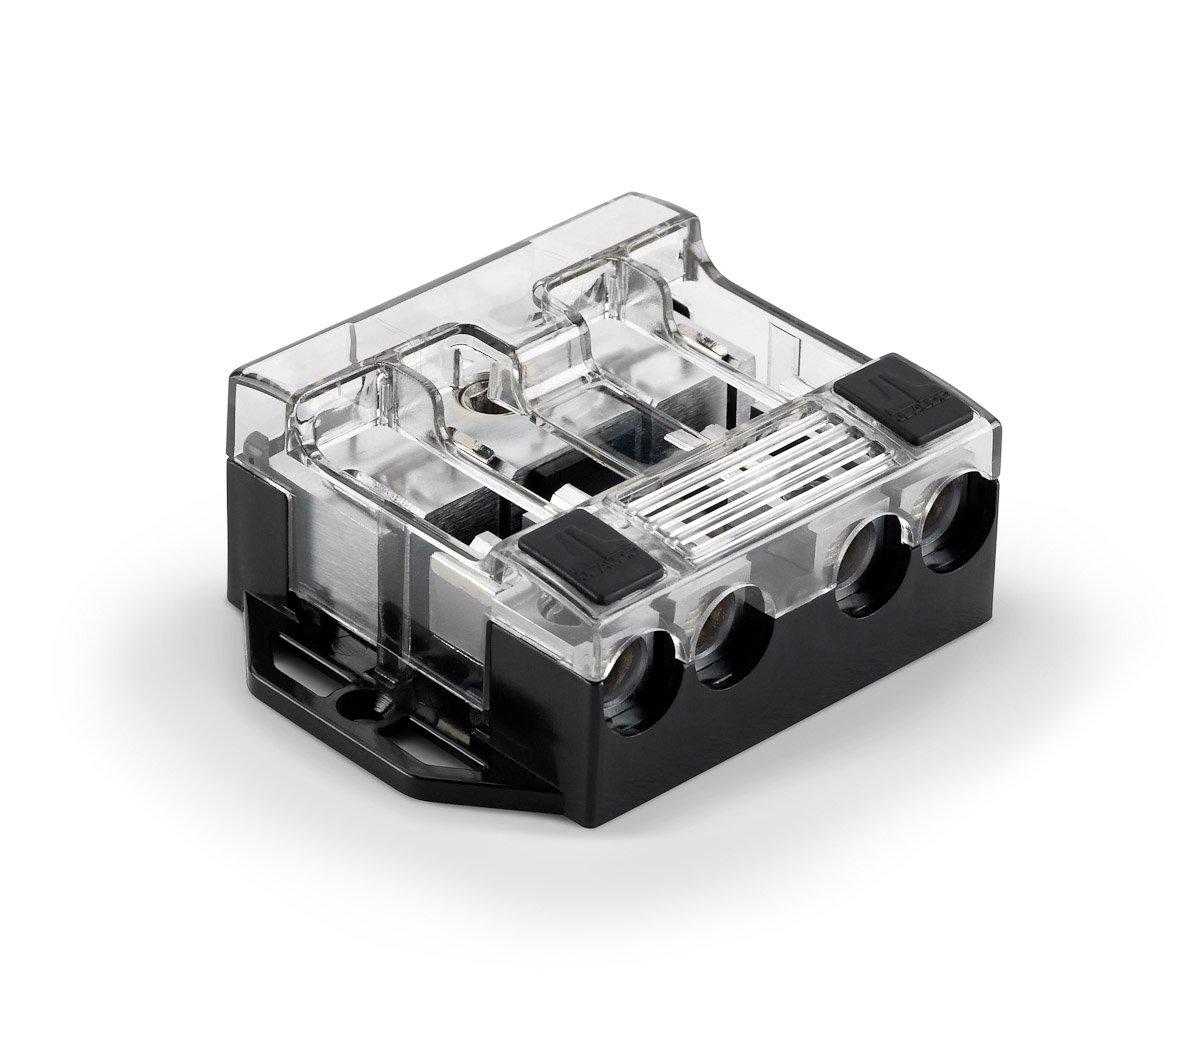 JL Audio XD-FDBU-4 MAXI Fused Power Distribution Block